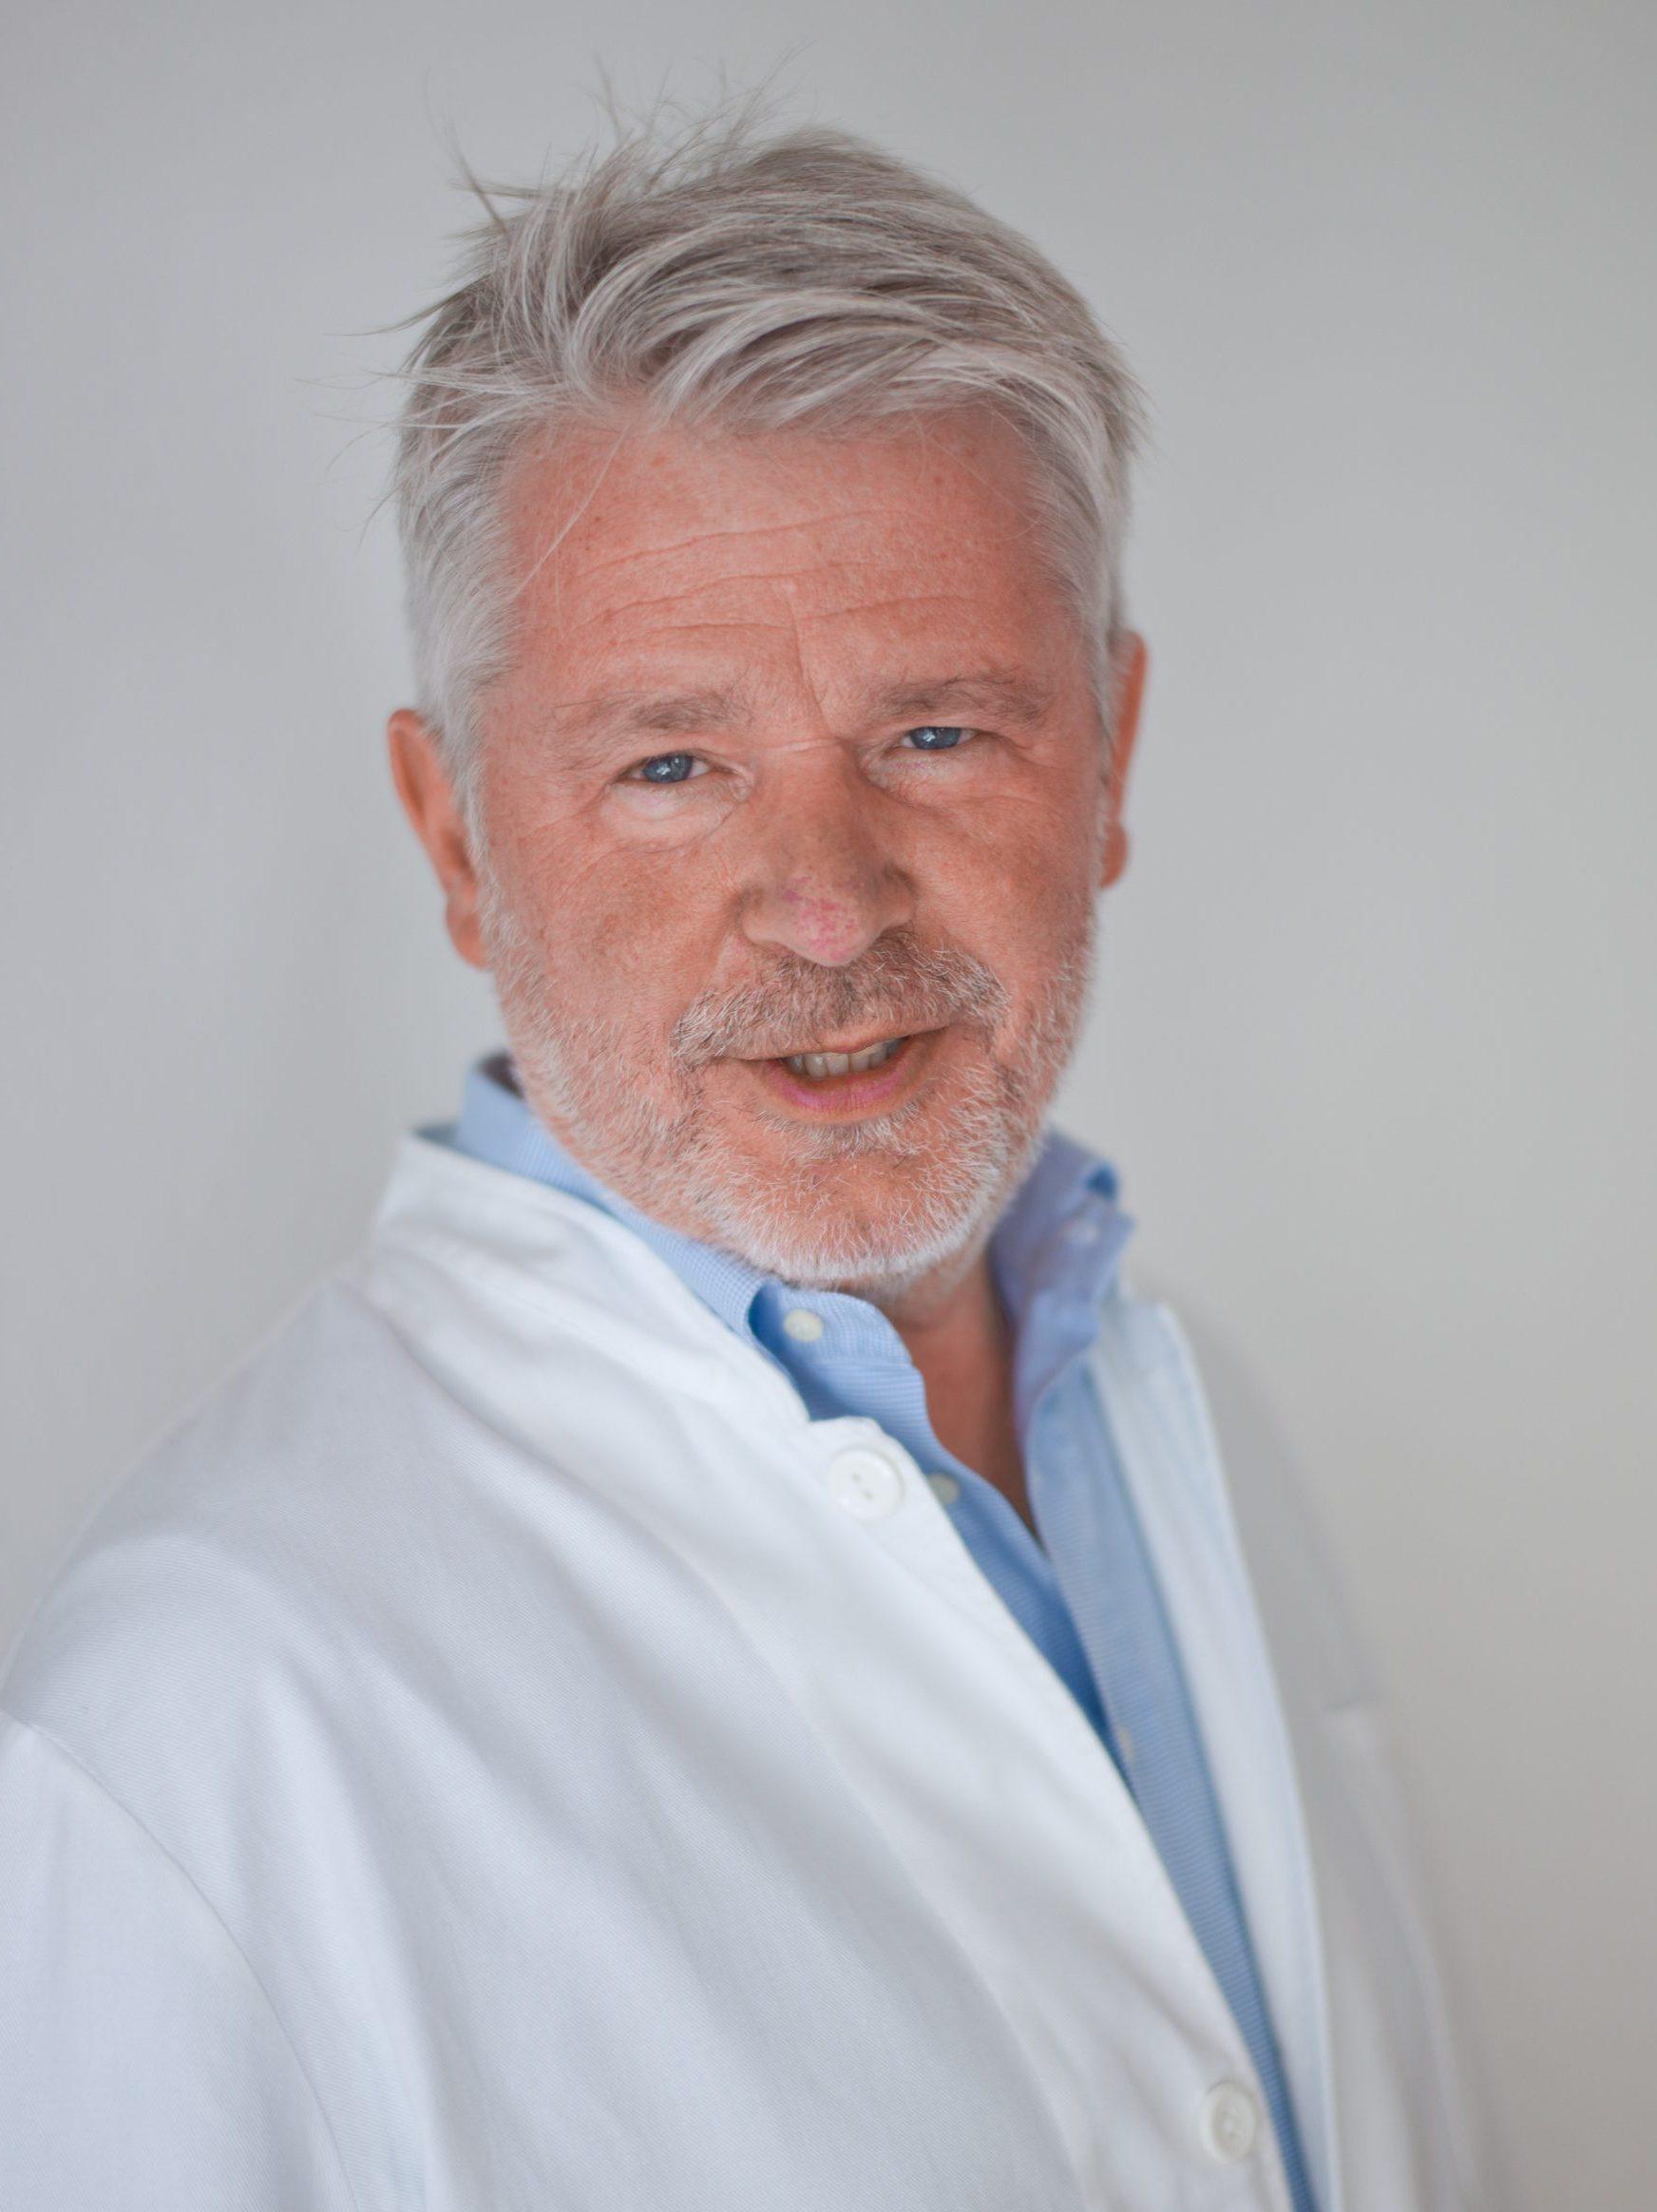 Medizinisch Abnehmen mit dem Arzt Dr. Stephan Schimpf